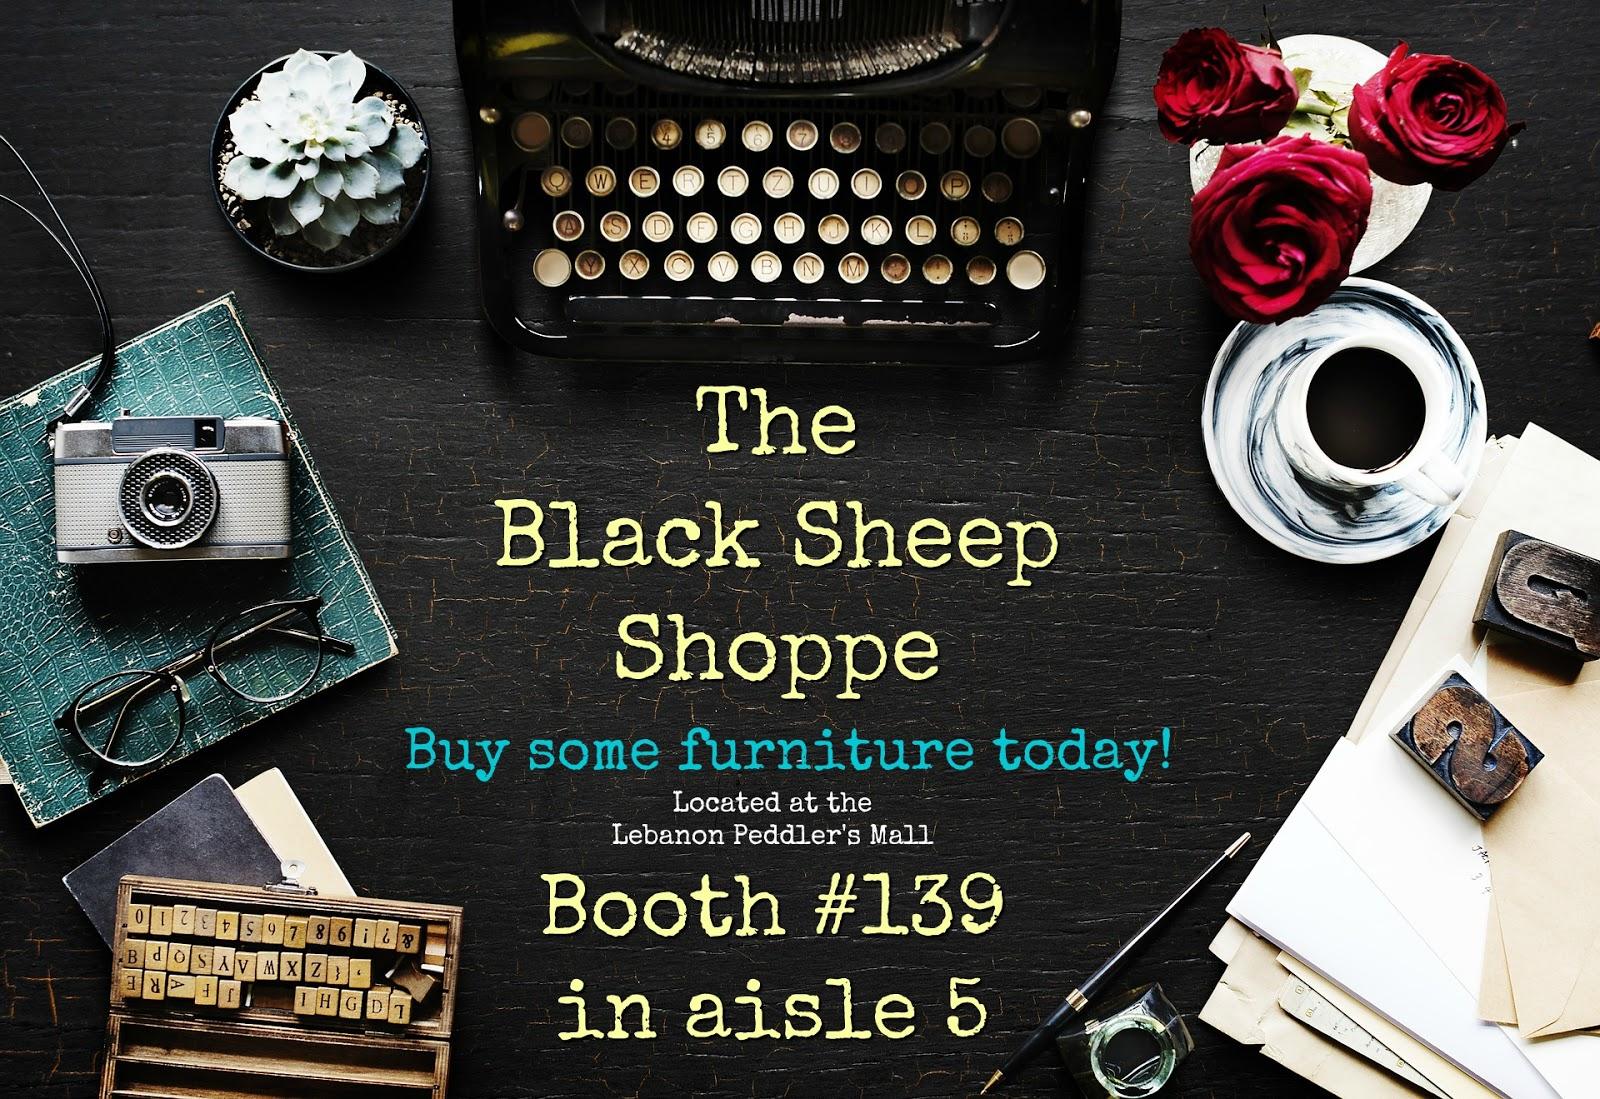 The Black Sheep Shoppe in Lebanon Ohio